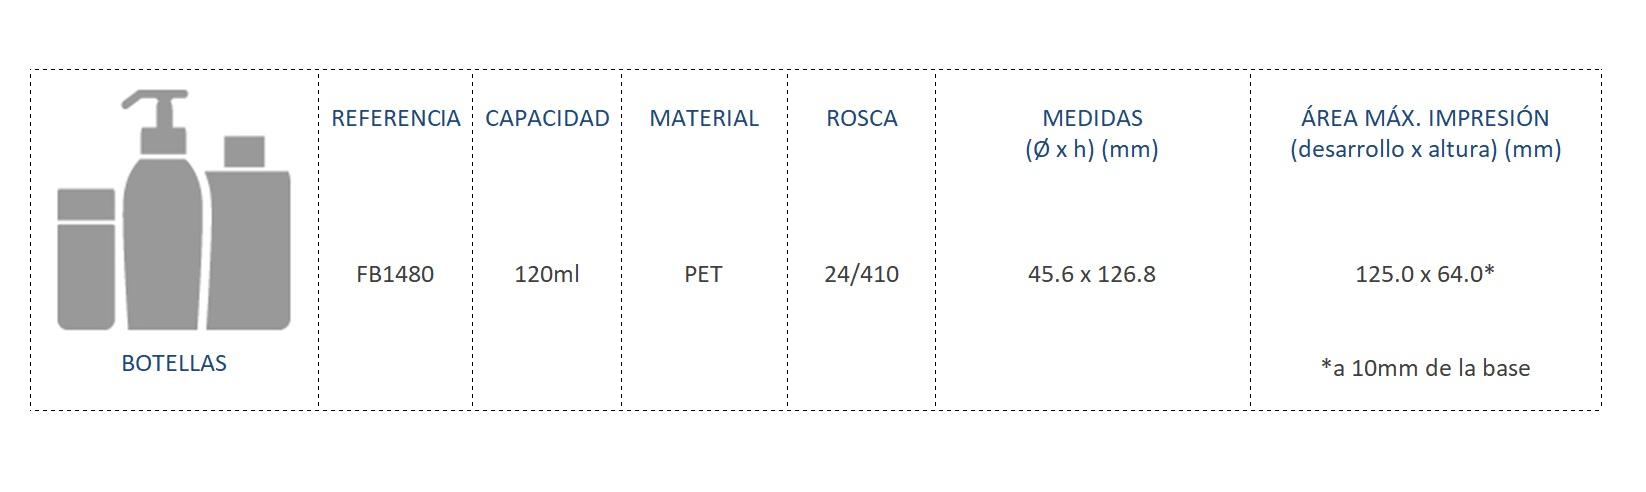 Cuadro de materiales FB1480